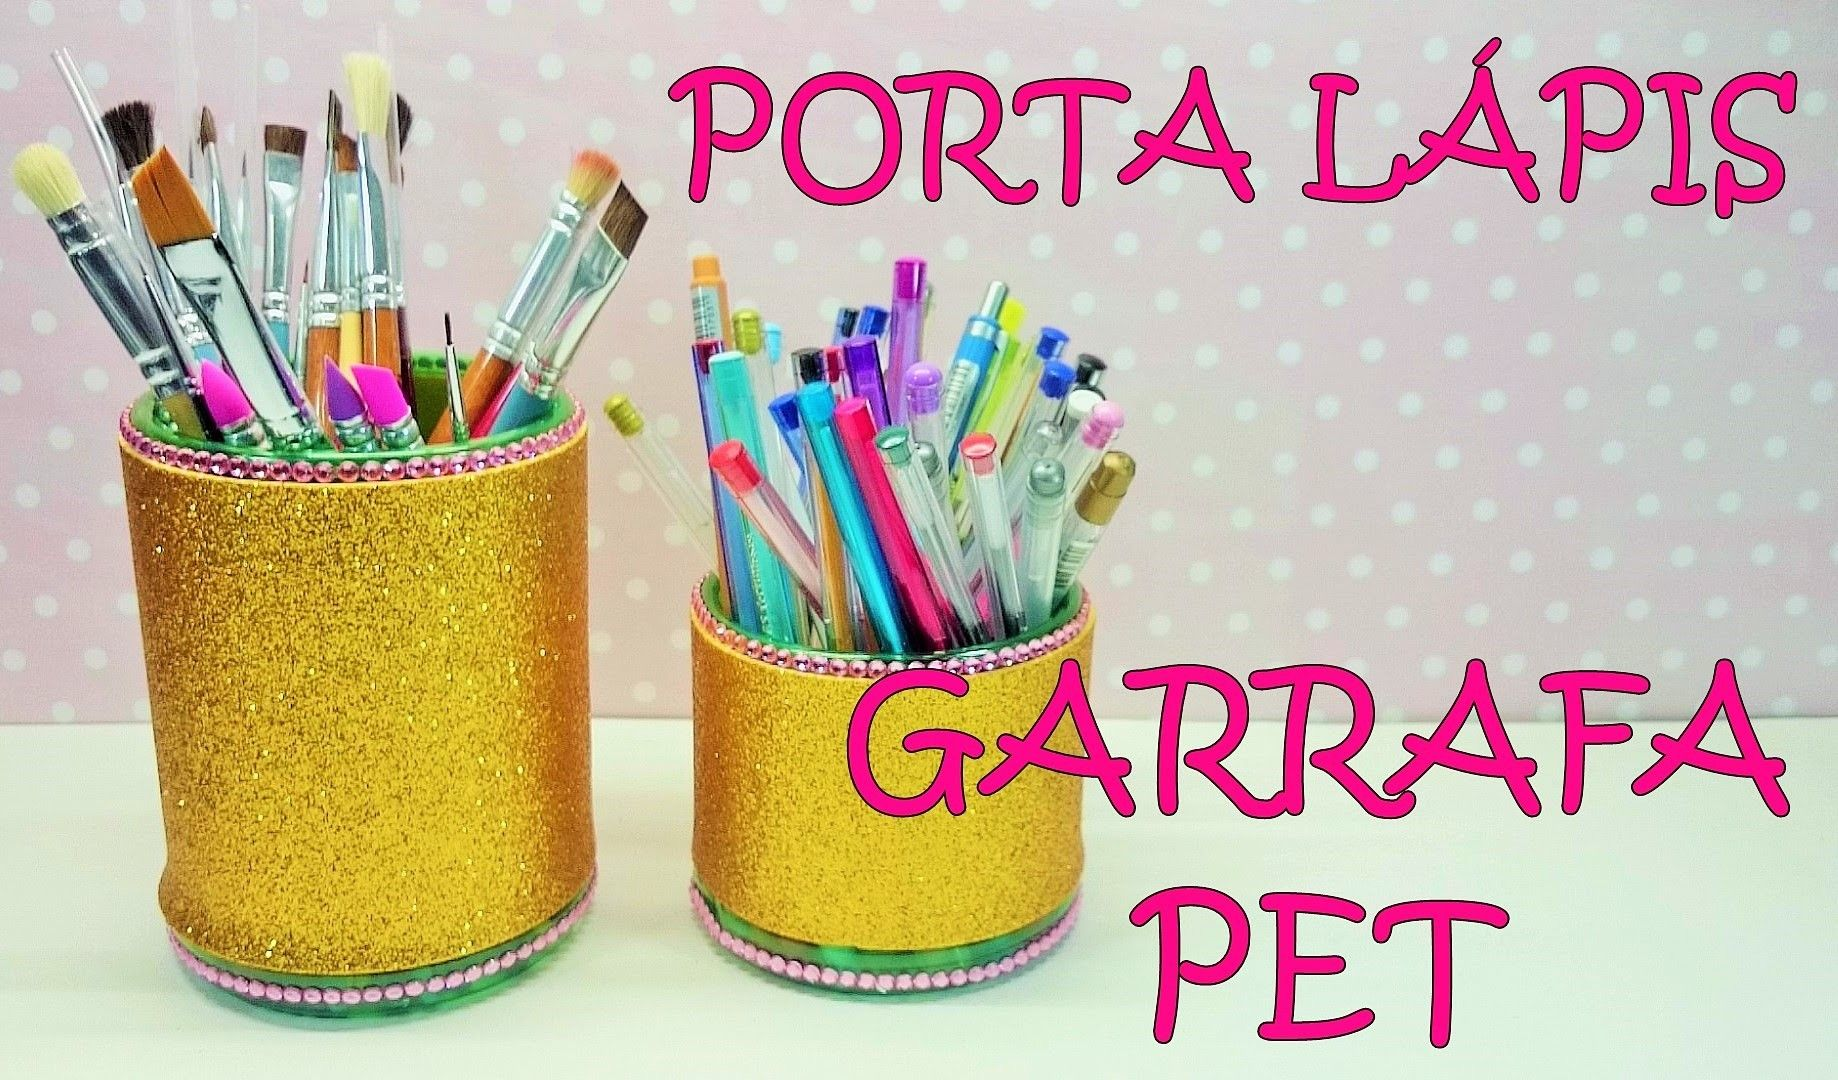 DIY PORTA LÁPIS RECICLANDO GARRAFA PET porta lapis reciclavel Reciclando garrafa pet  # Decoração De Festa Com Garrafa Pet